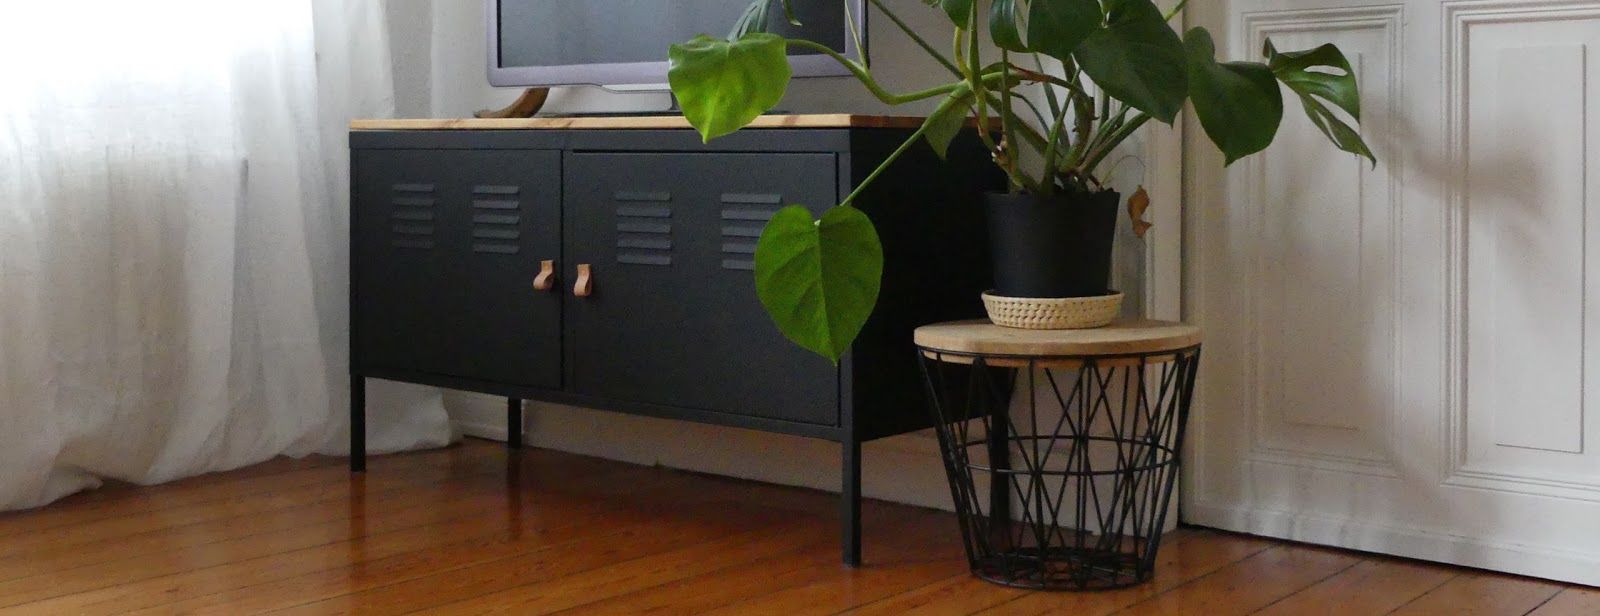 IKEA Hack - aus klapprigem PS-Schrank wird edle TV-Konsole ...